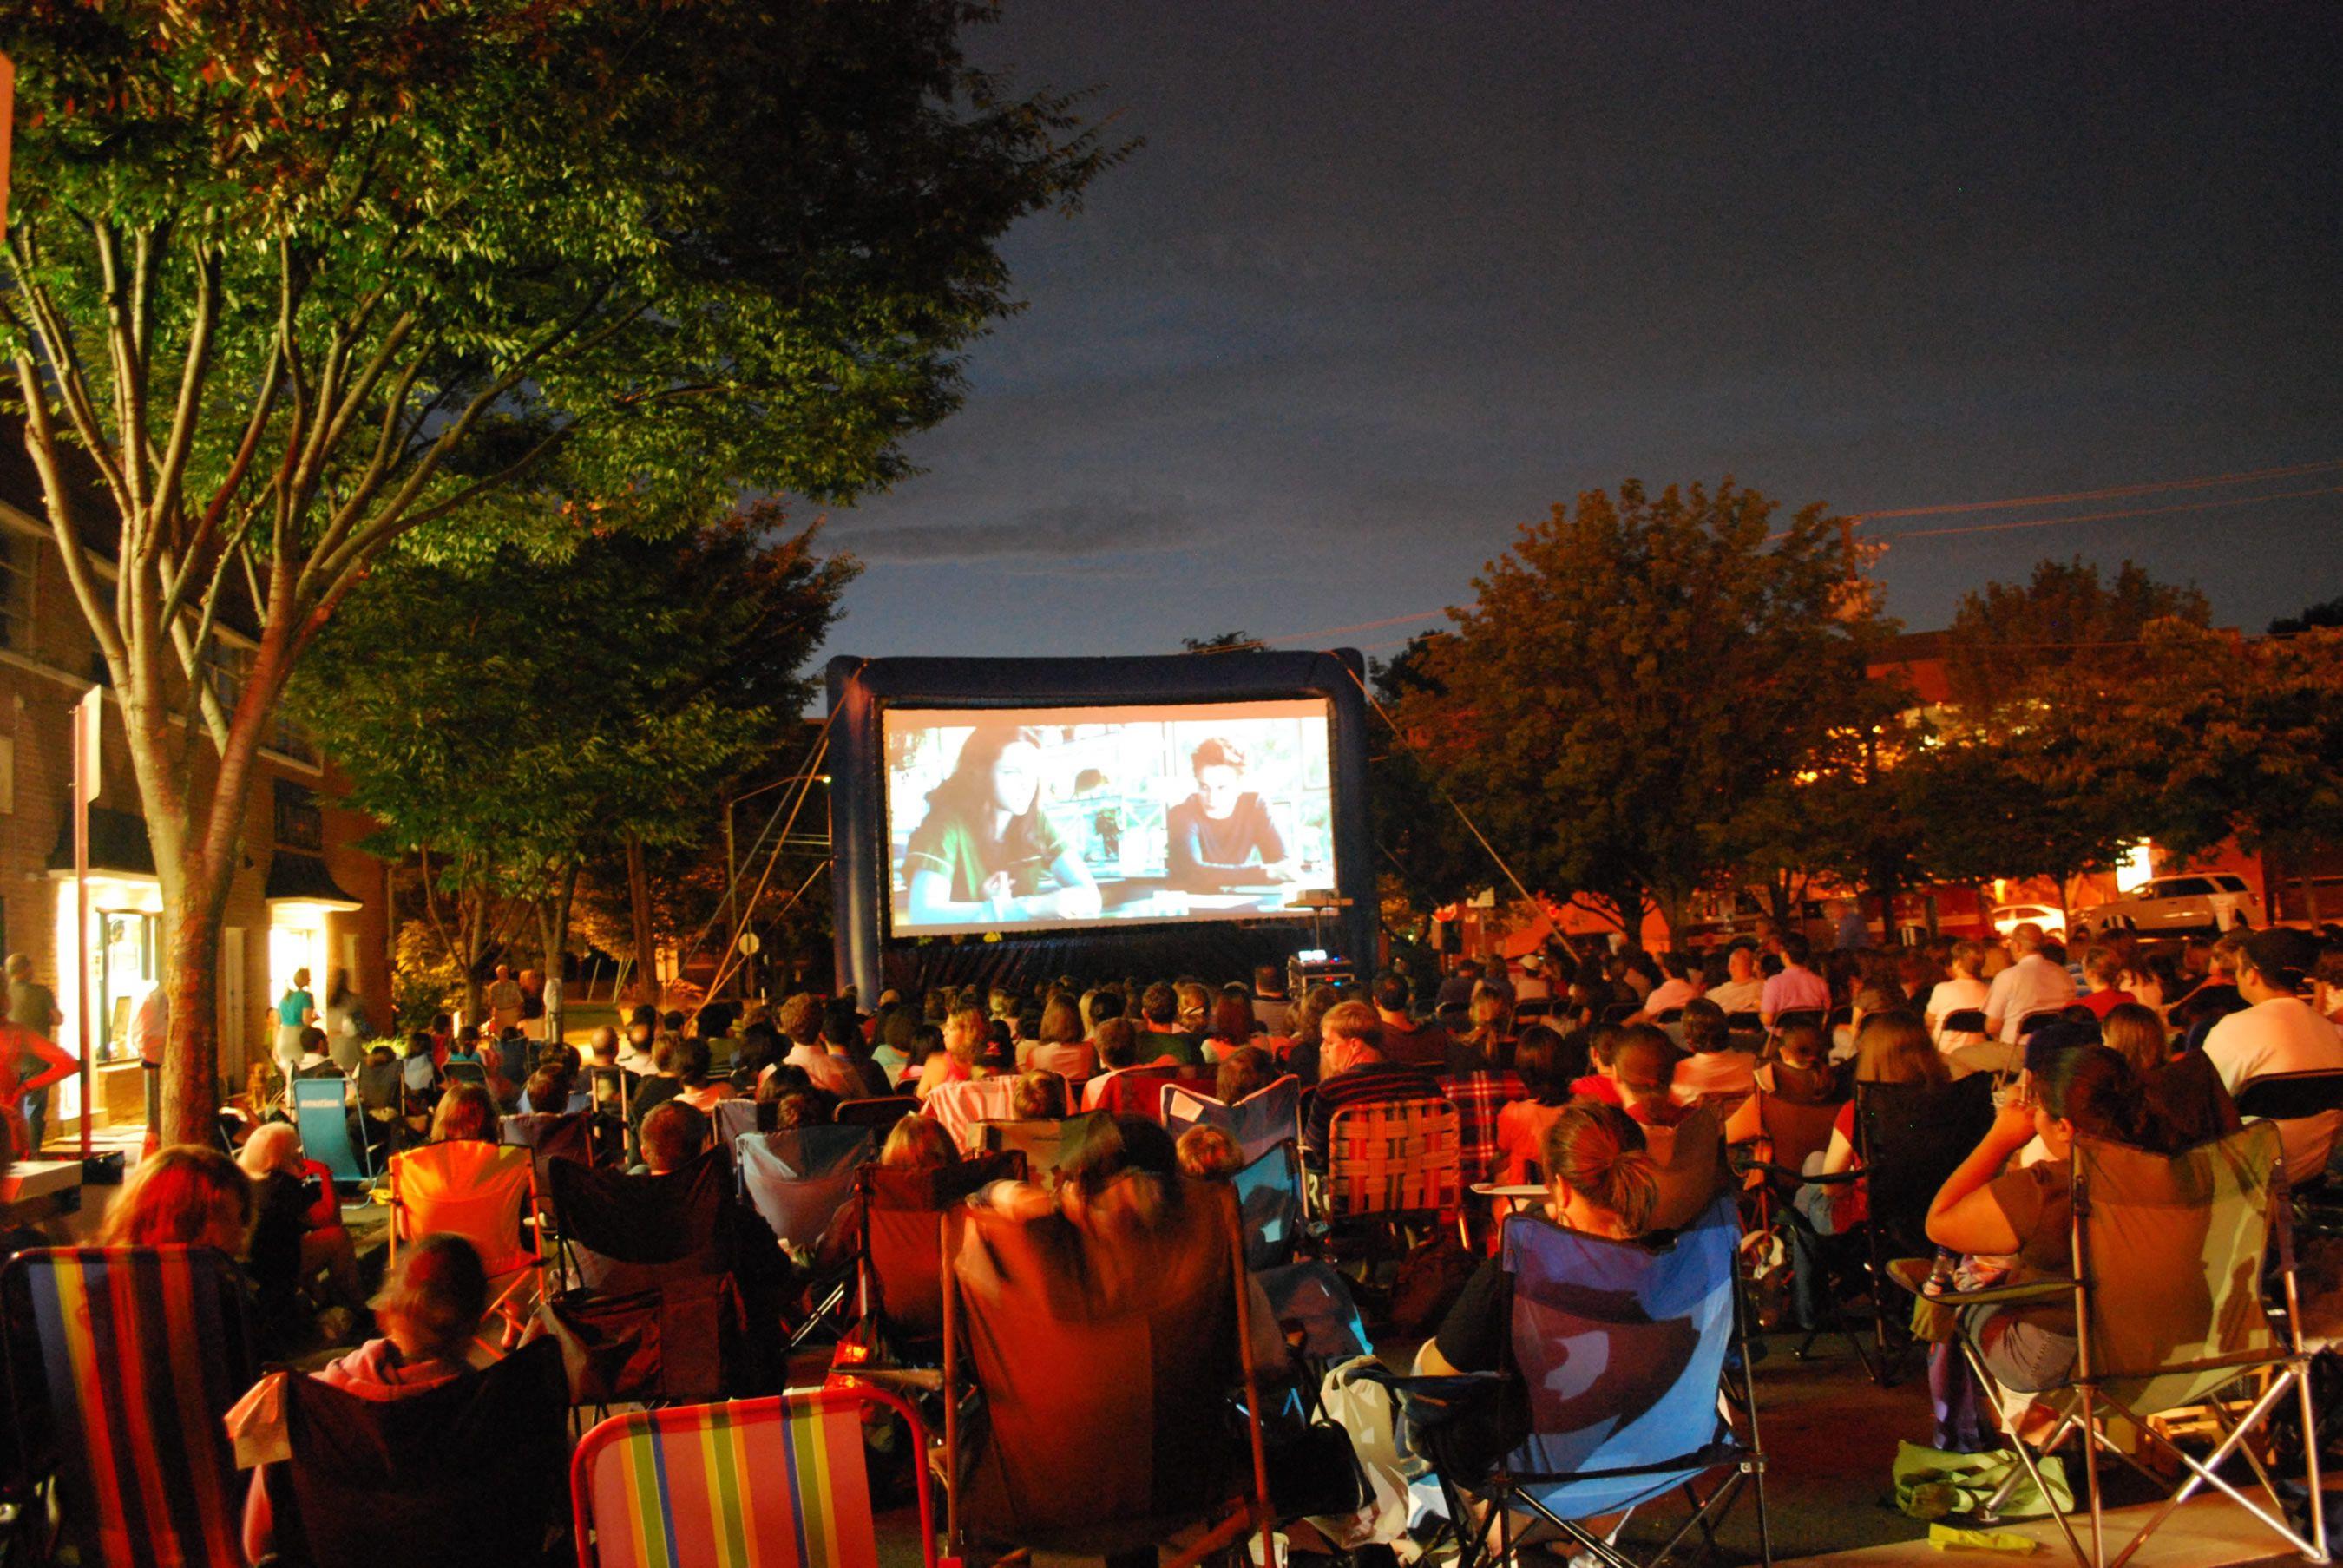 Bethesda Outdoor Movies Summer 2017